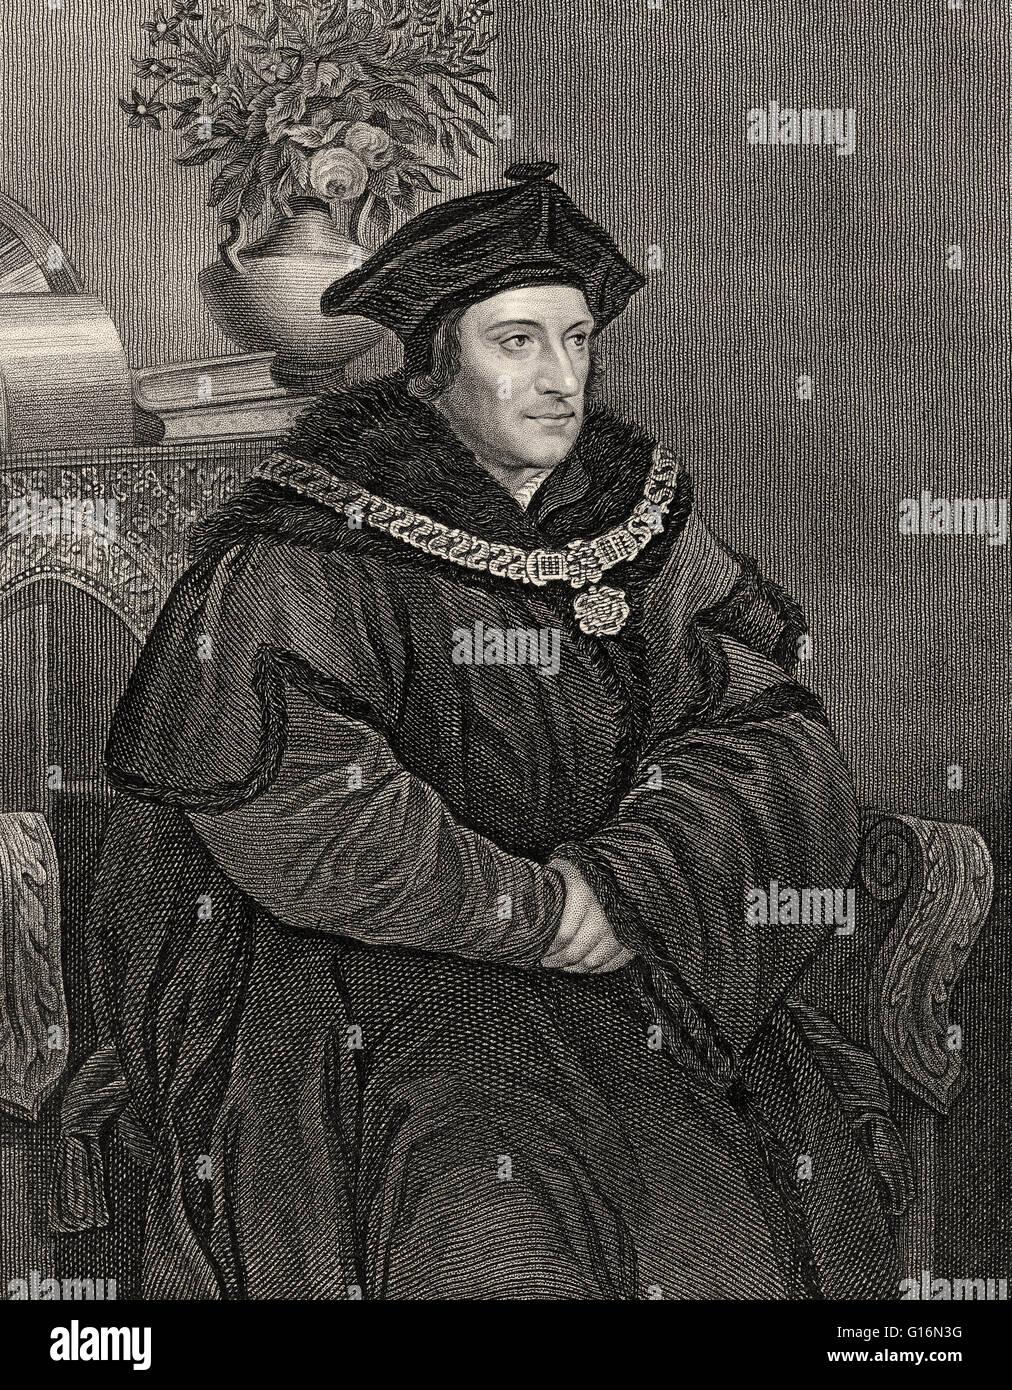 Sir Thomas More, Thomas Morus or More, 1478 - 1535, an English statesman, humanist writer and a saint and martyr Stock Photo